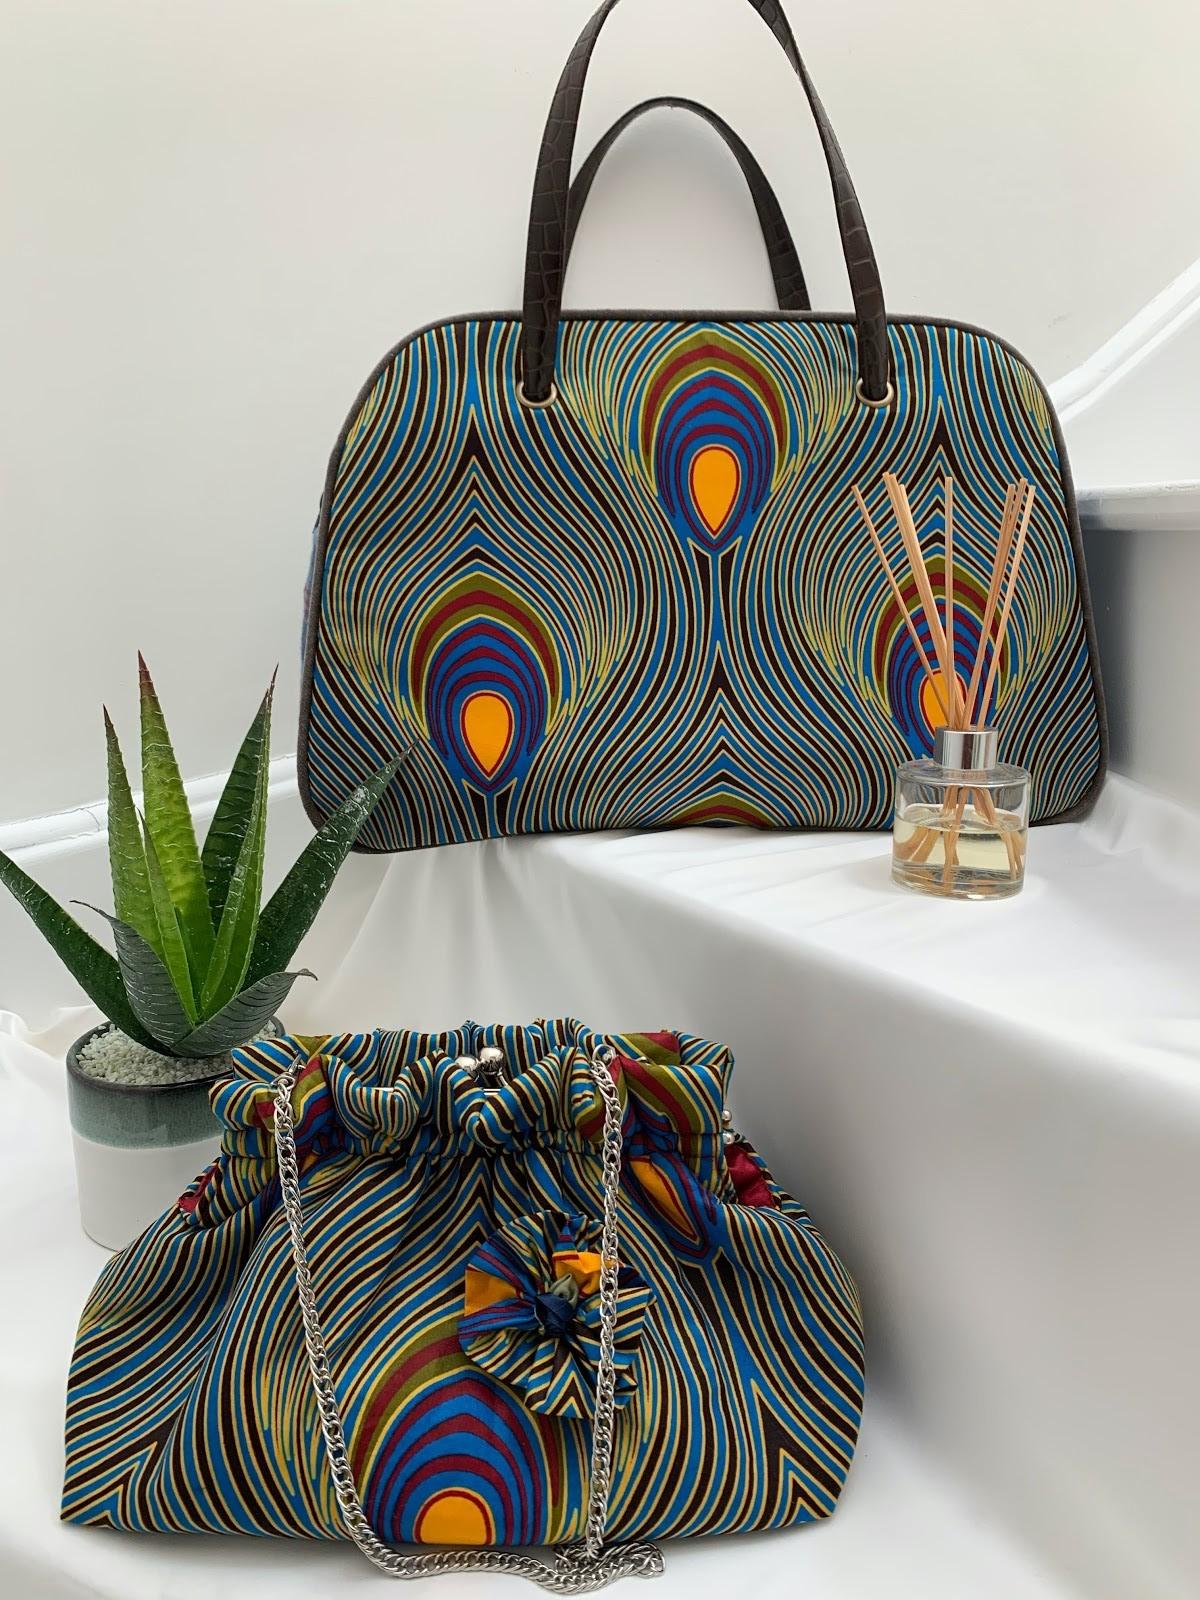 Monsini Peacock Bag 1 rotated